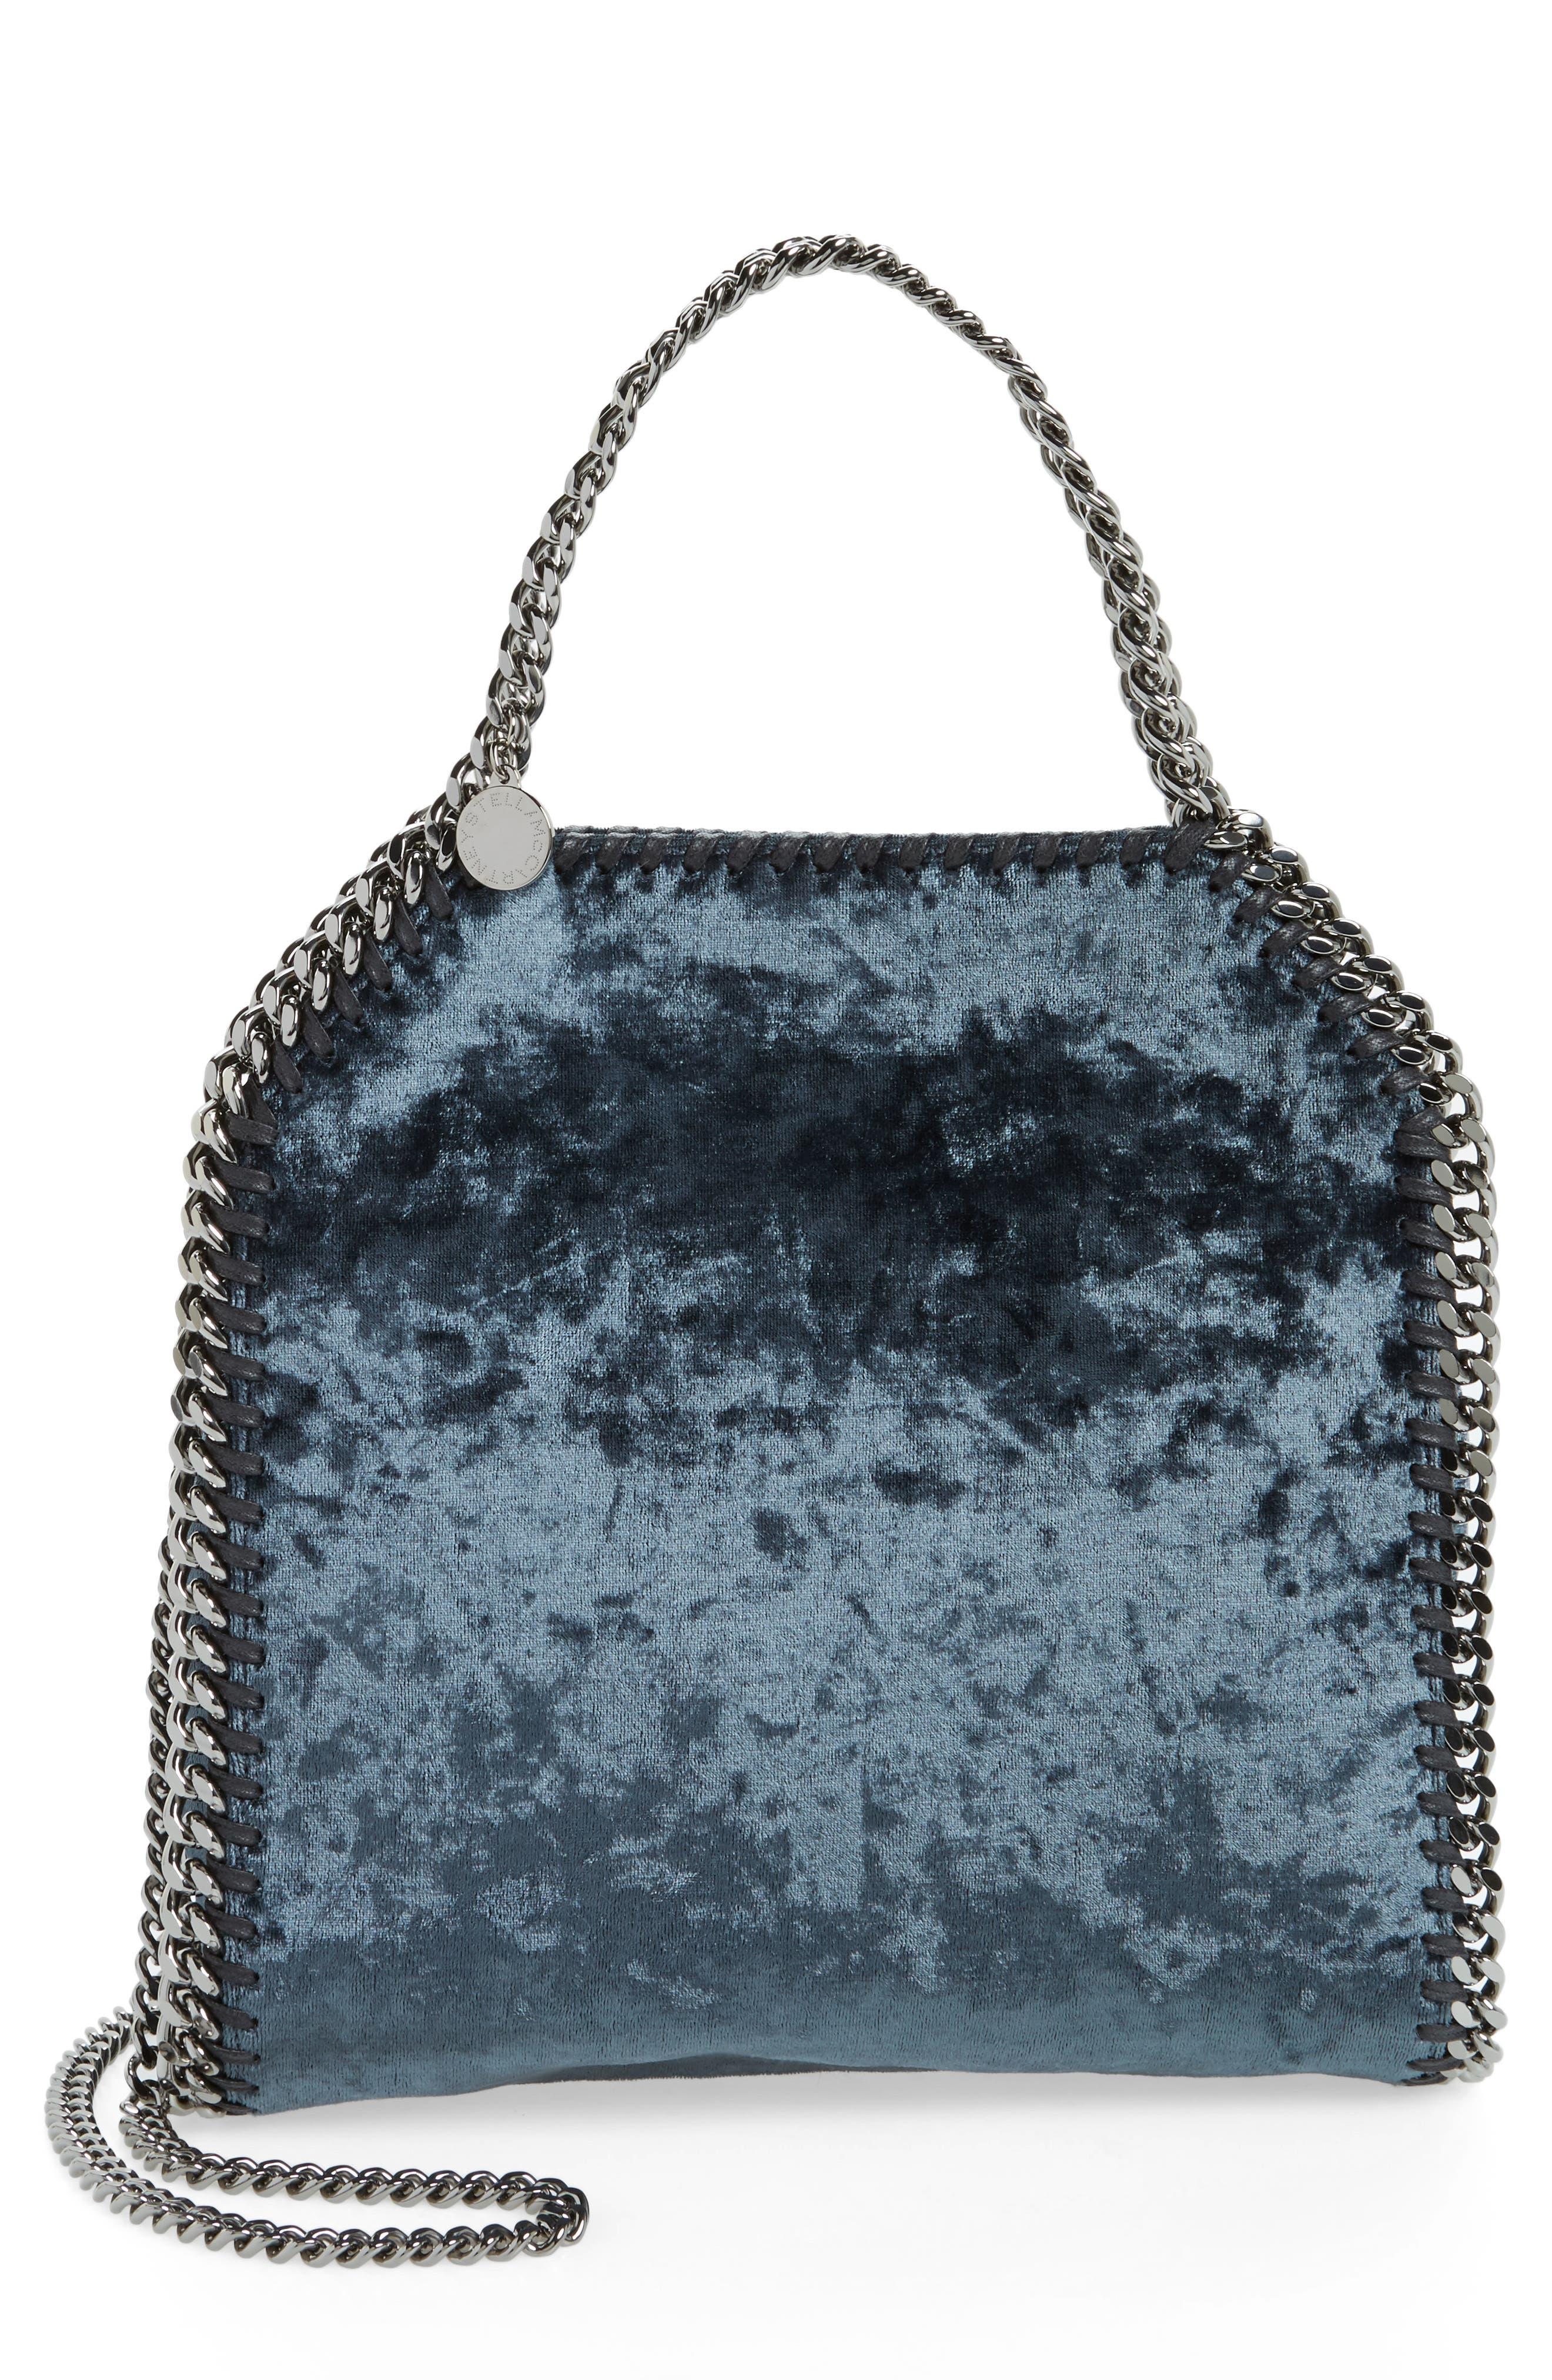 Alternate Image 1 Selected - Stella McCartney Mini Falabella Crushed Velvet Bag